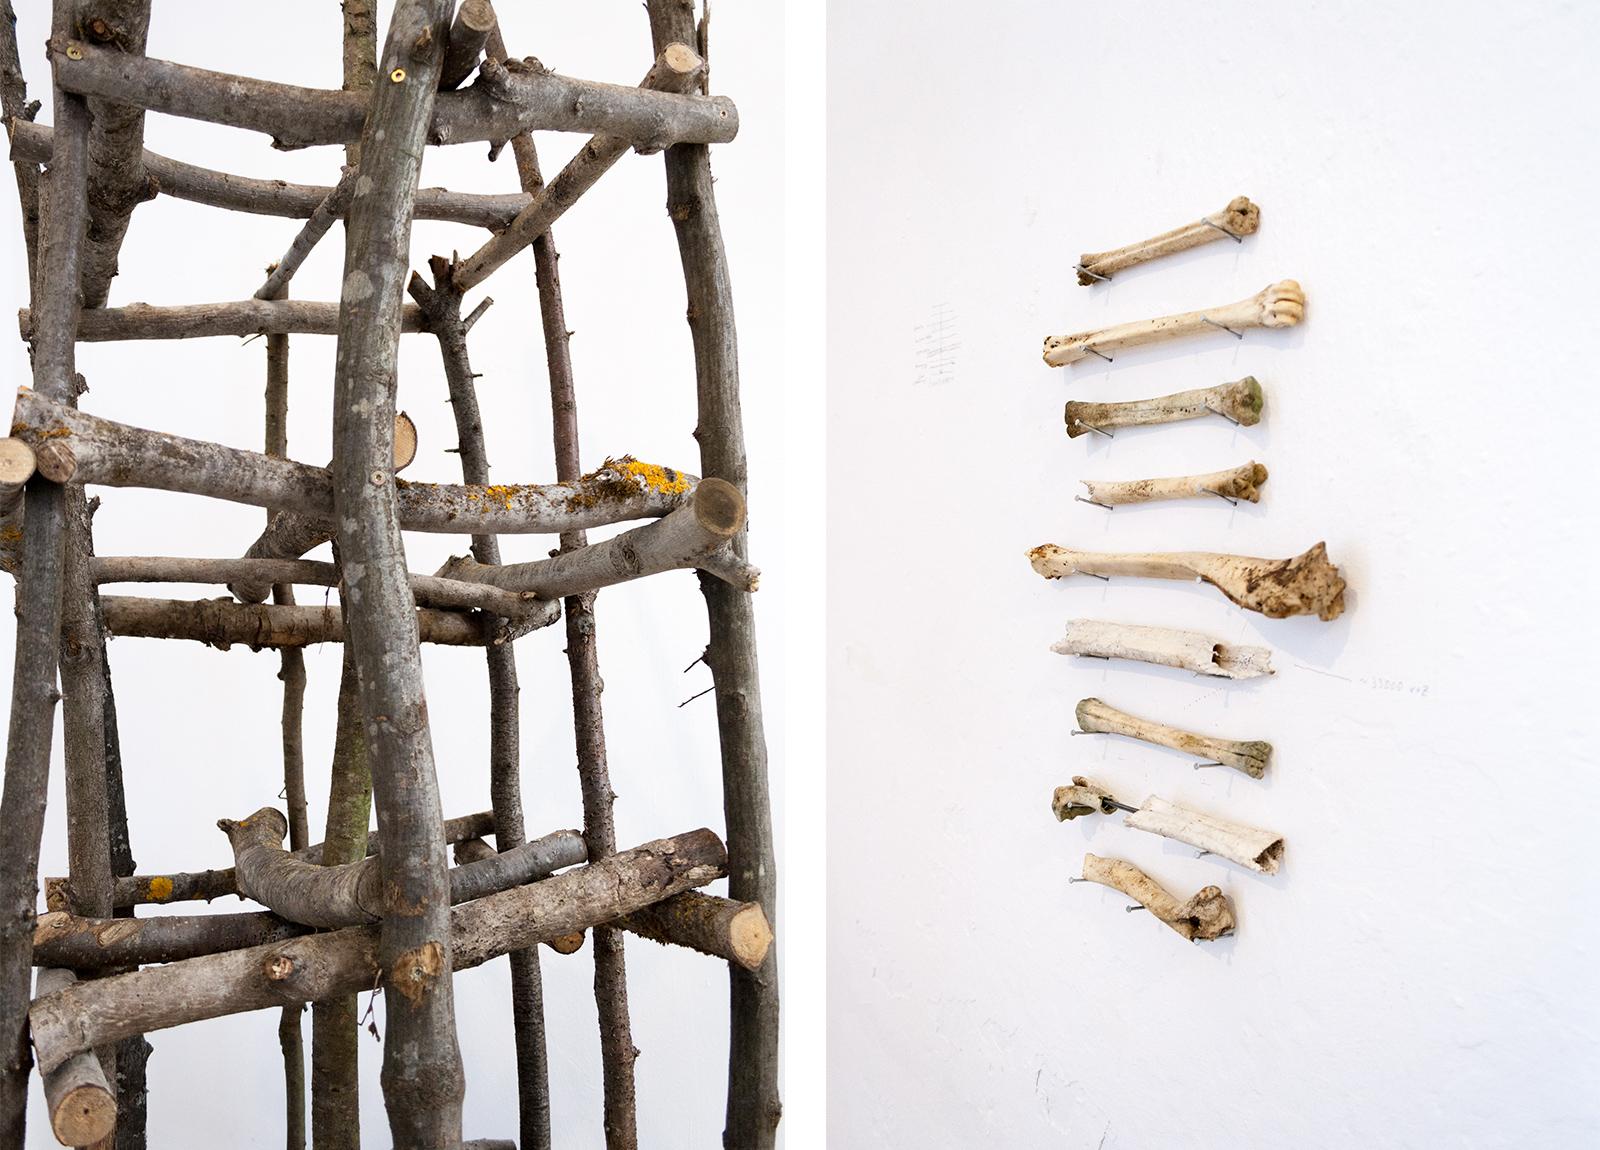 Left - Found bones from 2016 - 2018